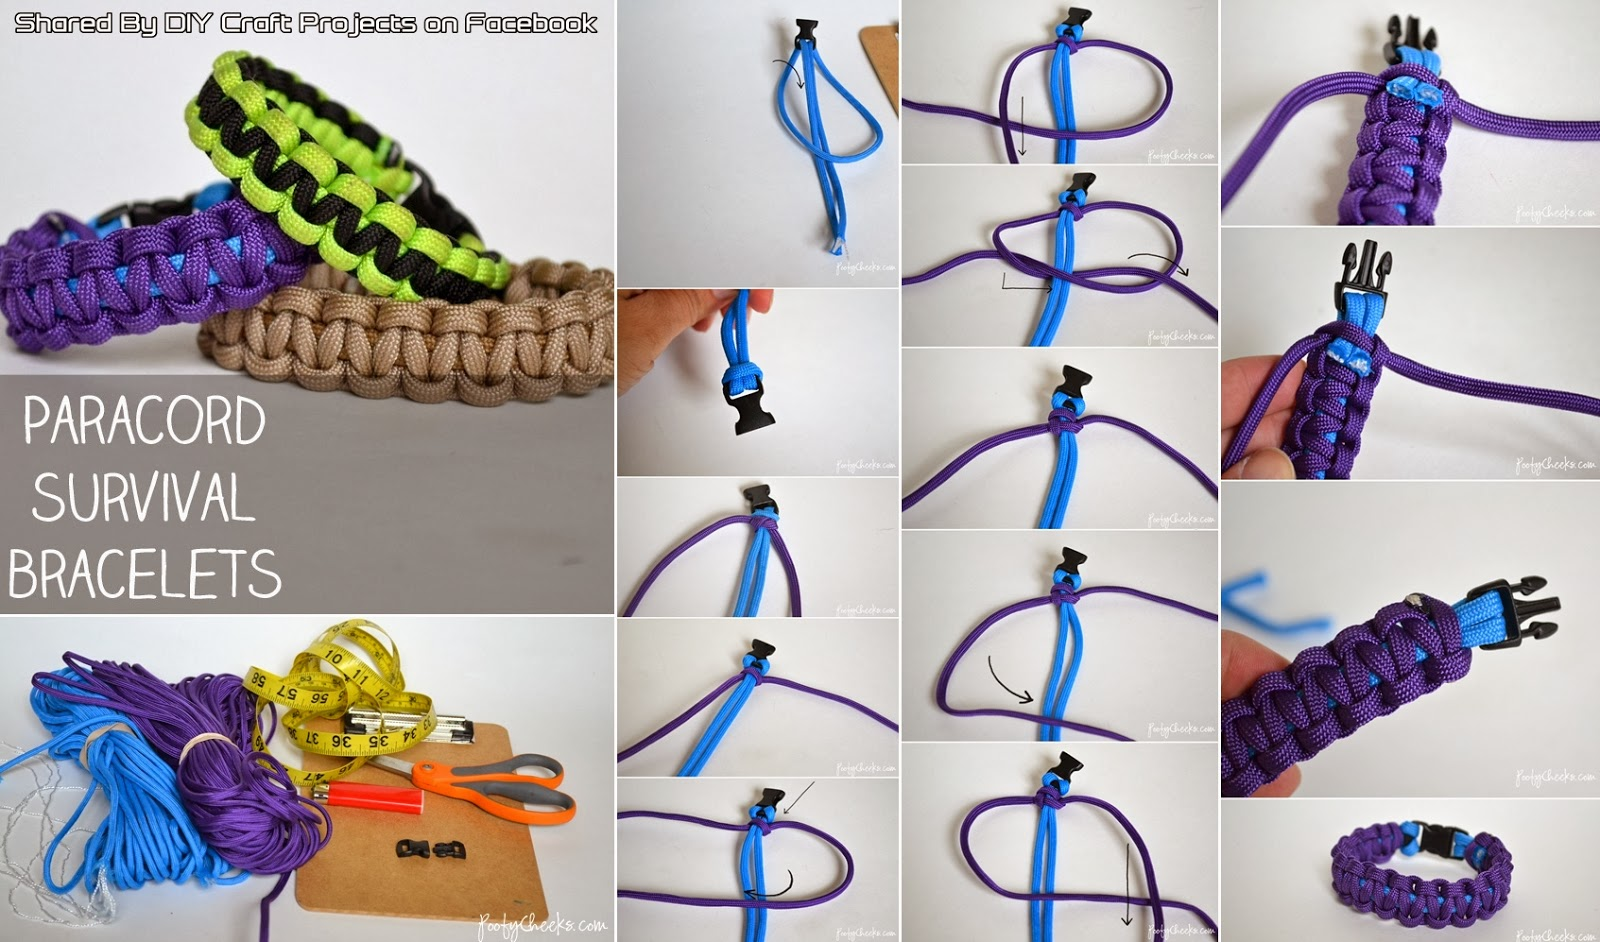 Diy paracord survival bracelet diy craft projects